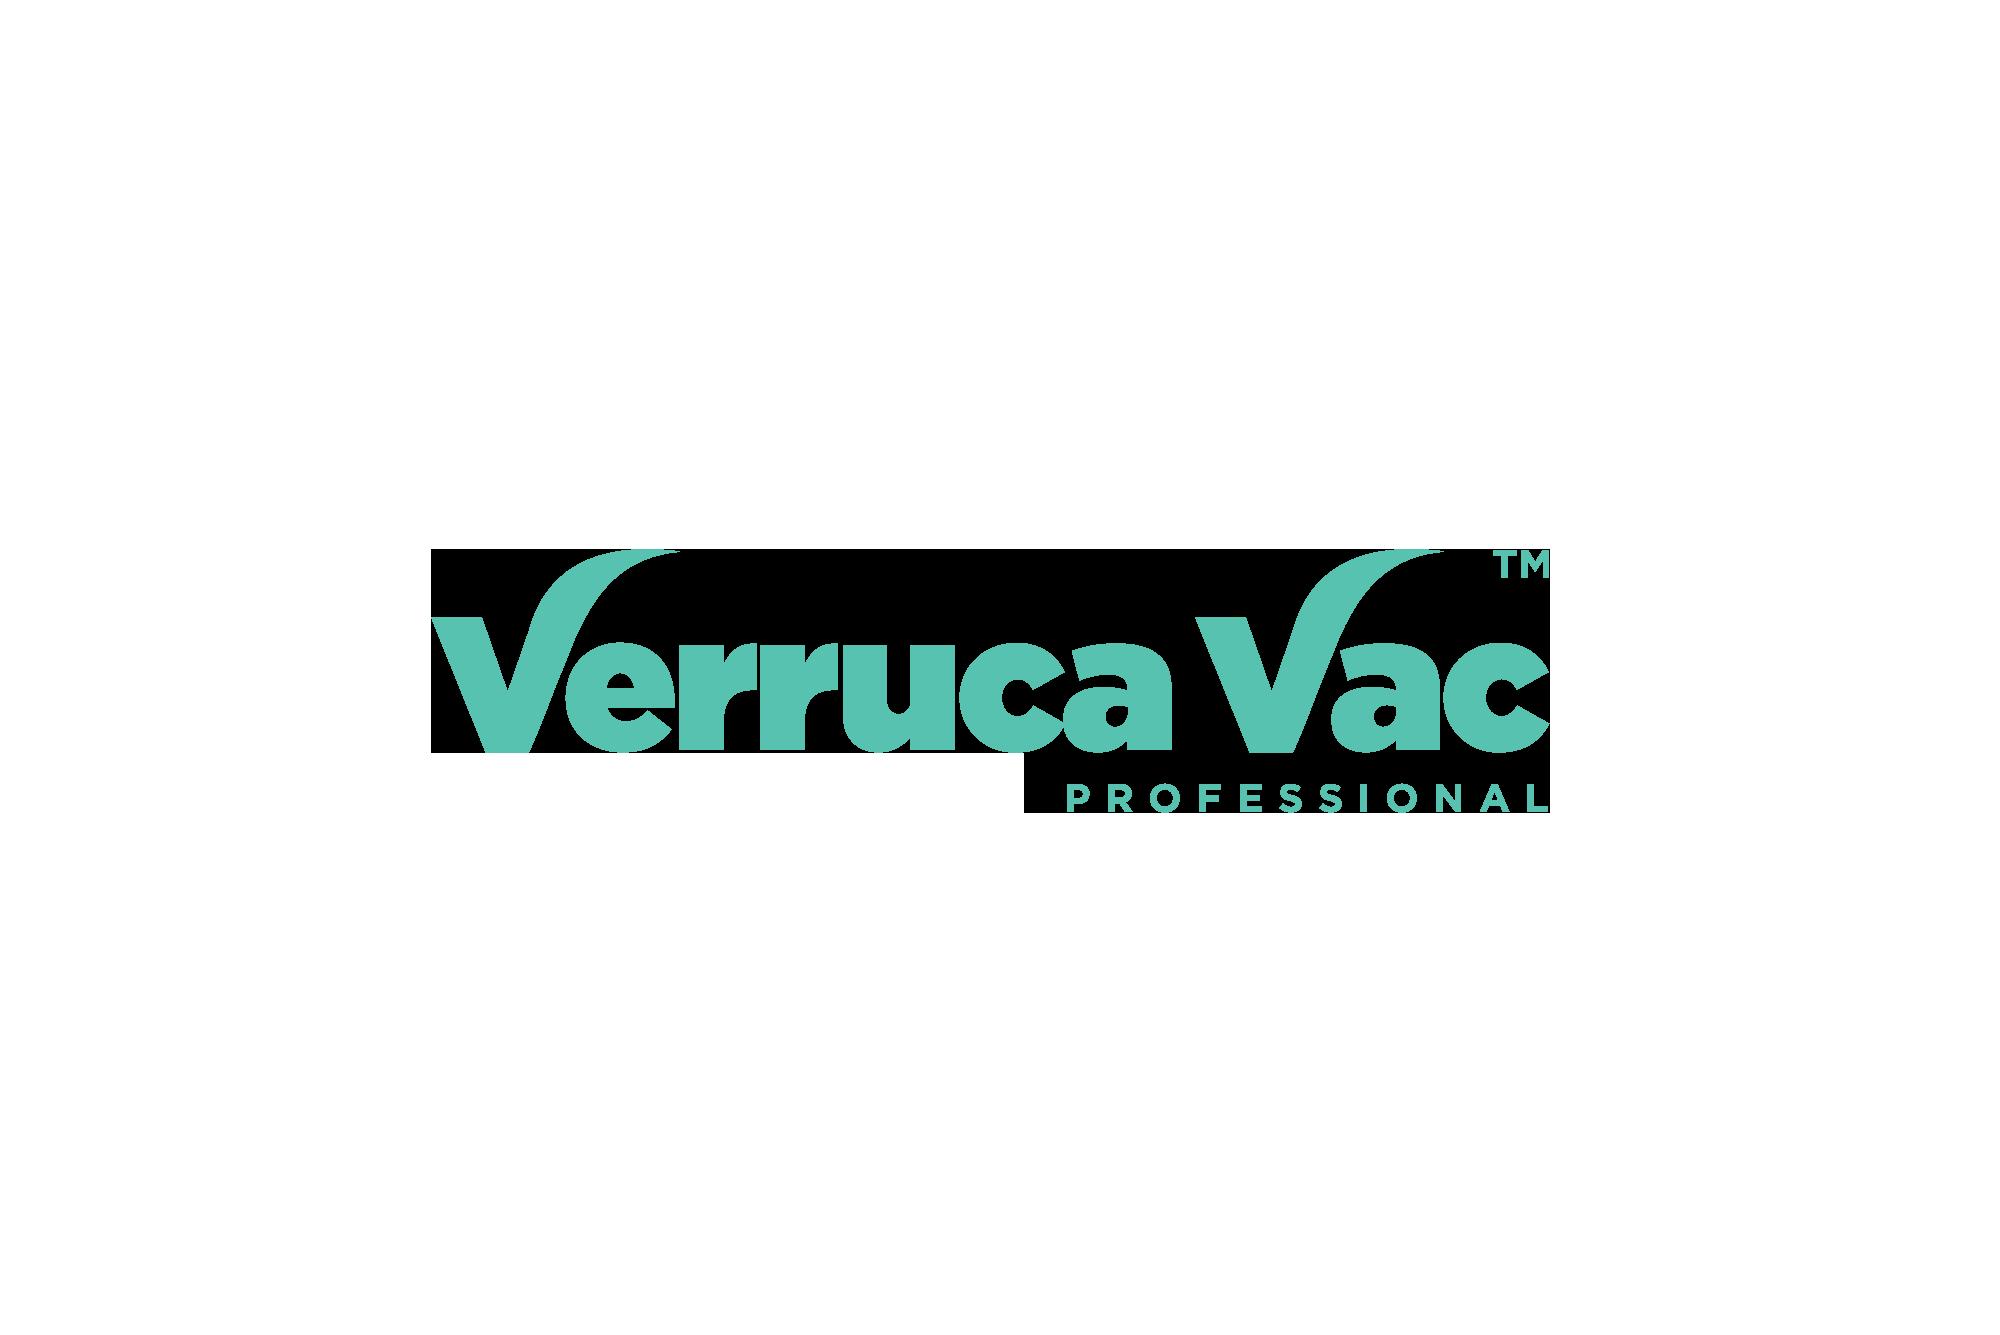 http://dubaipodiatry.com/wp-content/uploads/2015/12/DPC_logos_verruca_vac.png